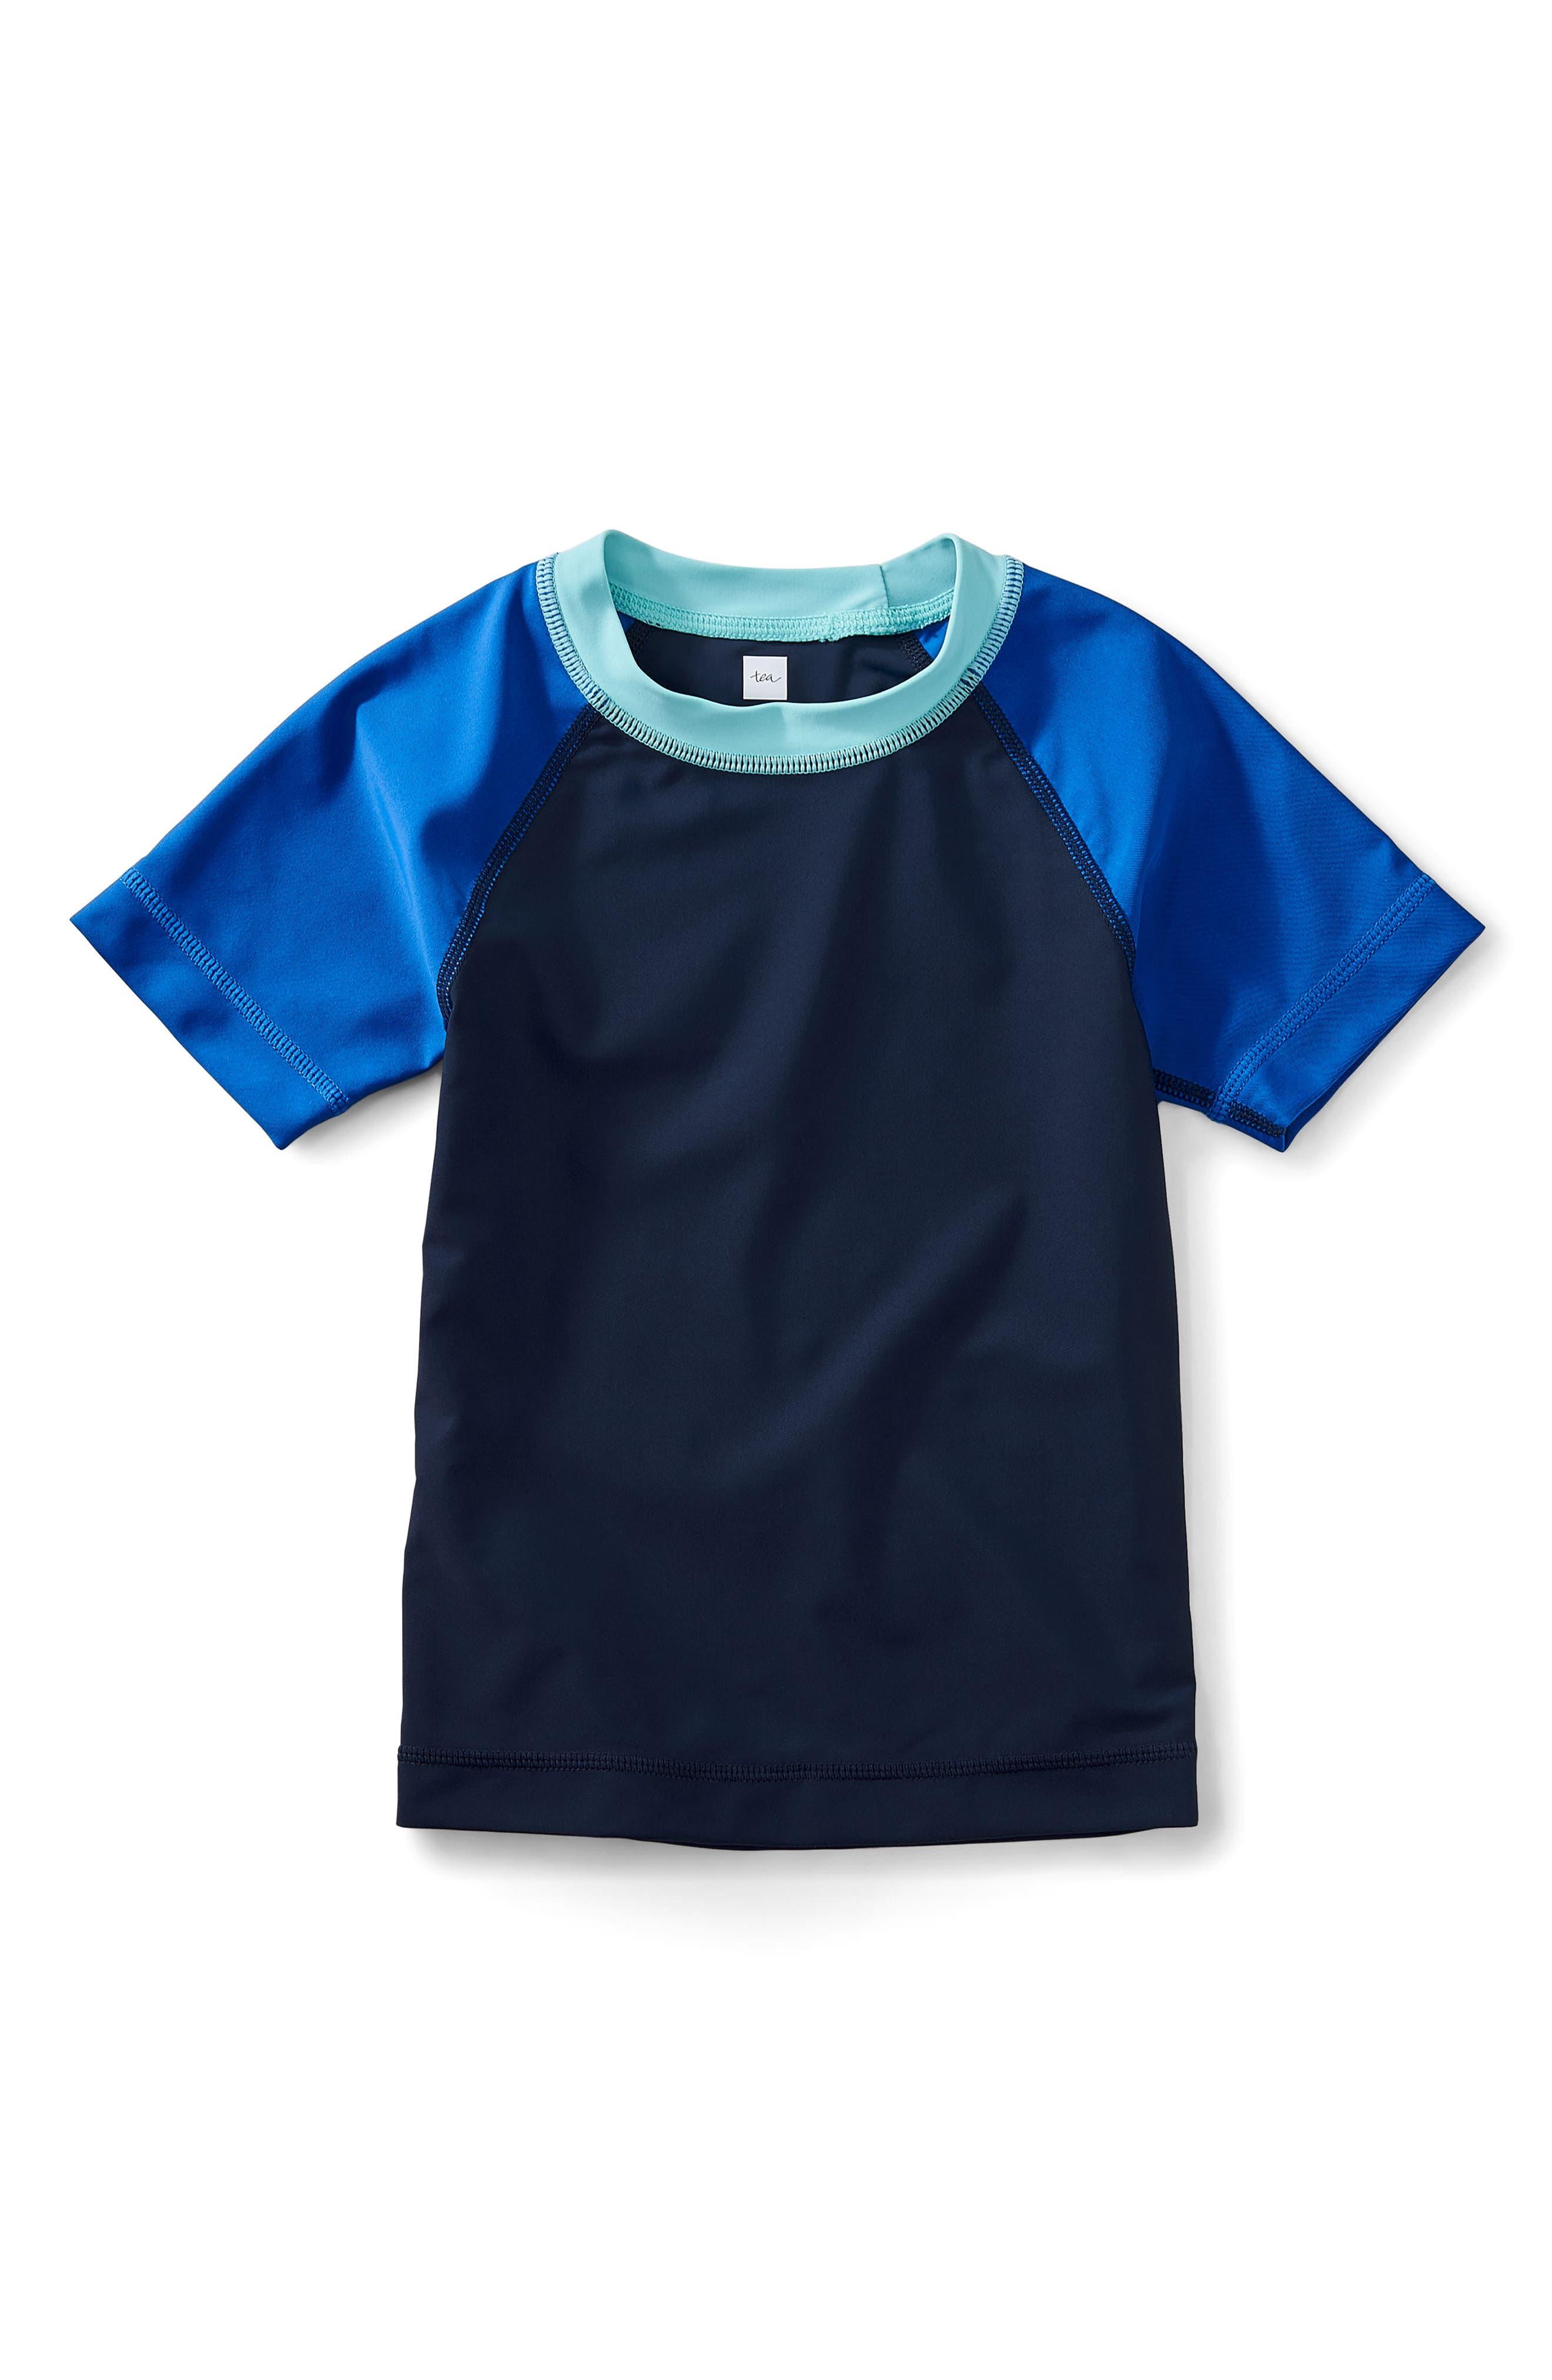 Rashguard Top,                         Main,                         color, Indigo